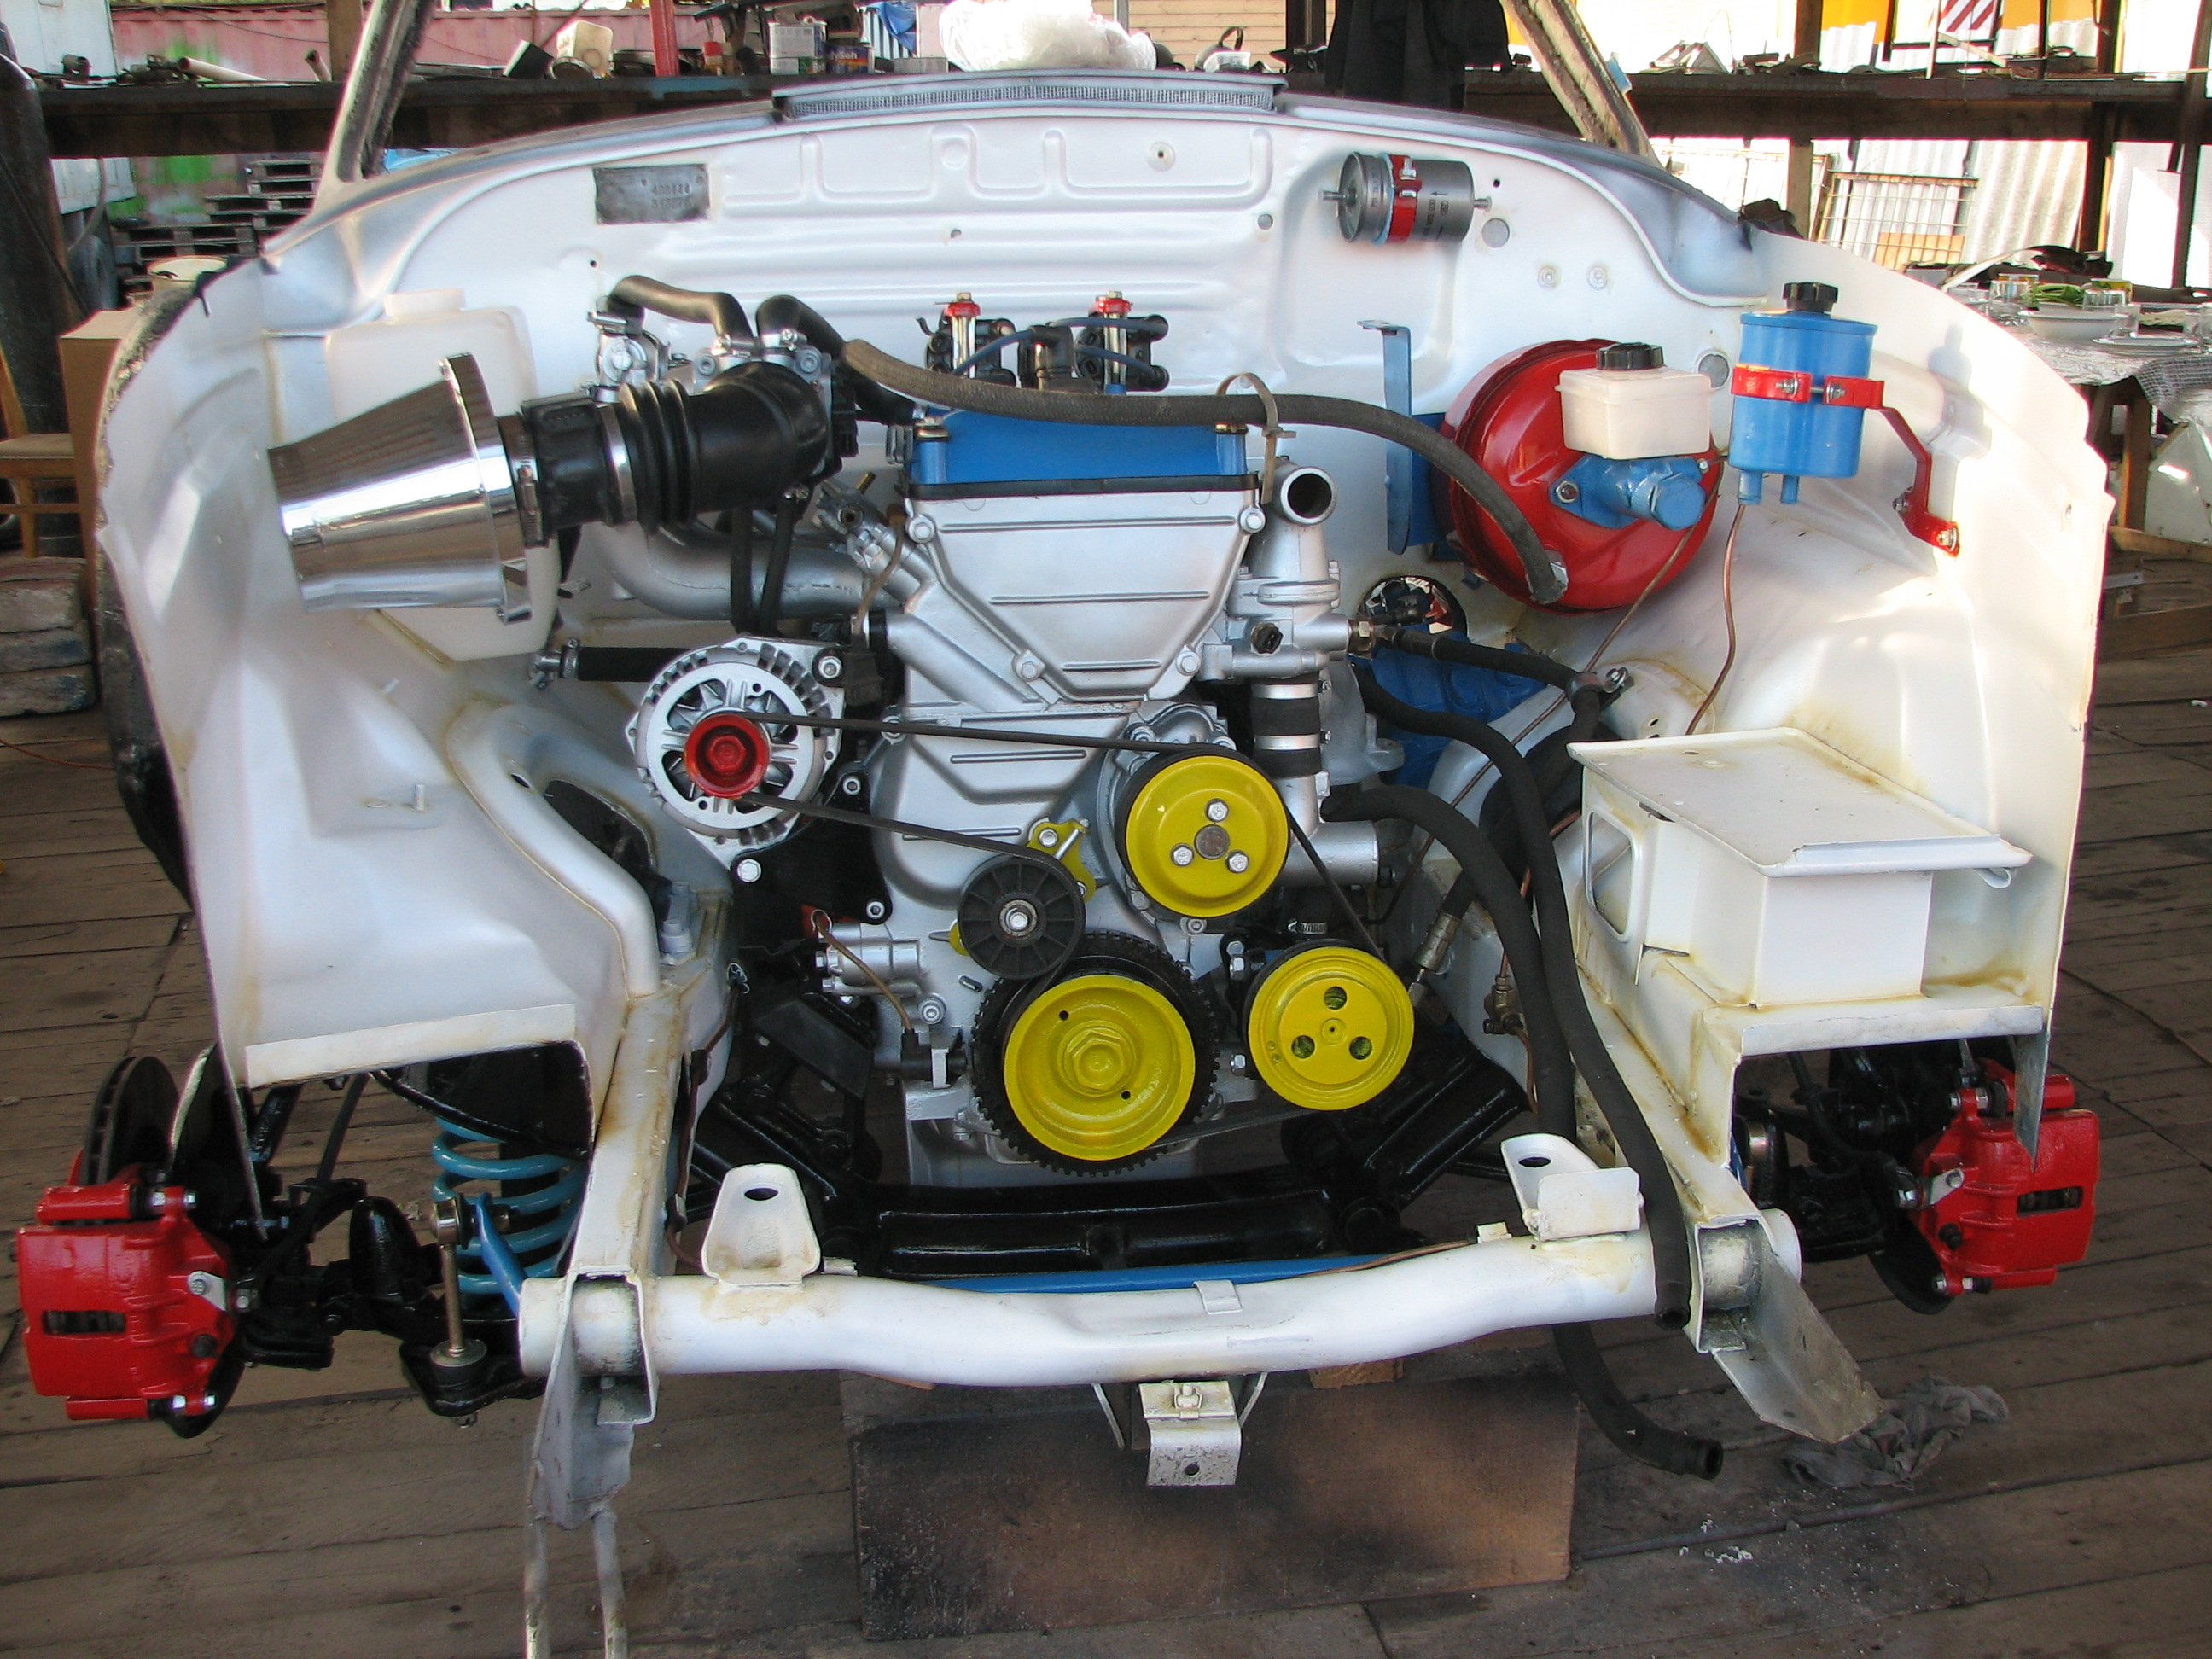 Тюнинг двигателя газ 21 своими руками